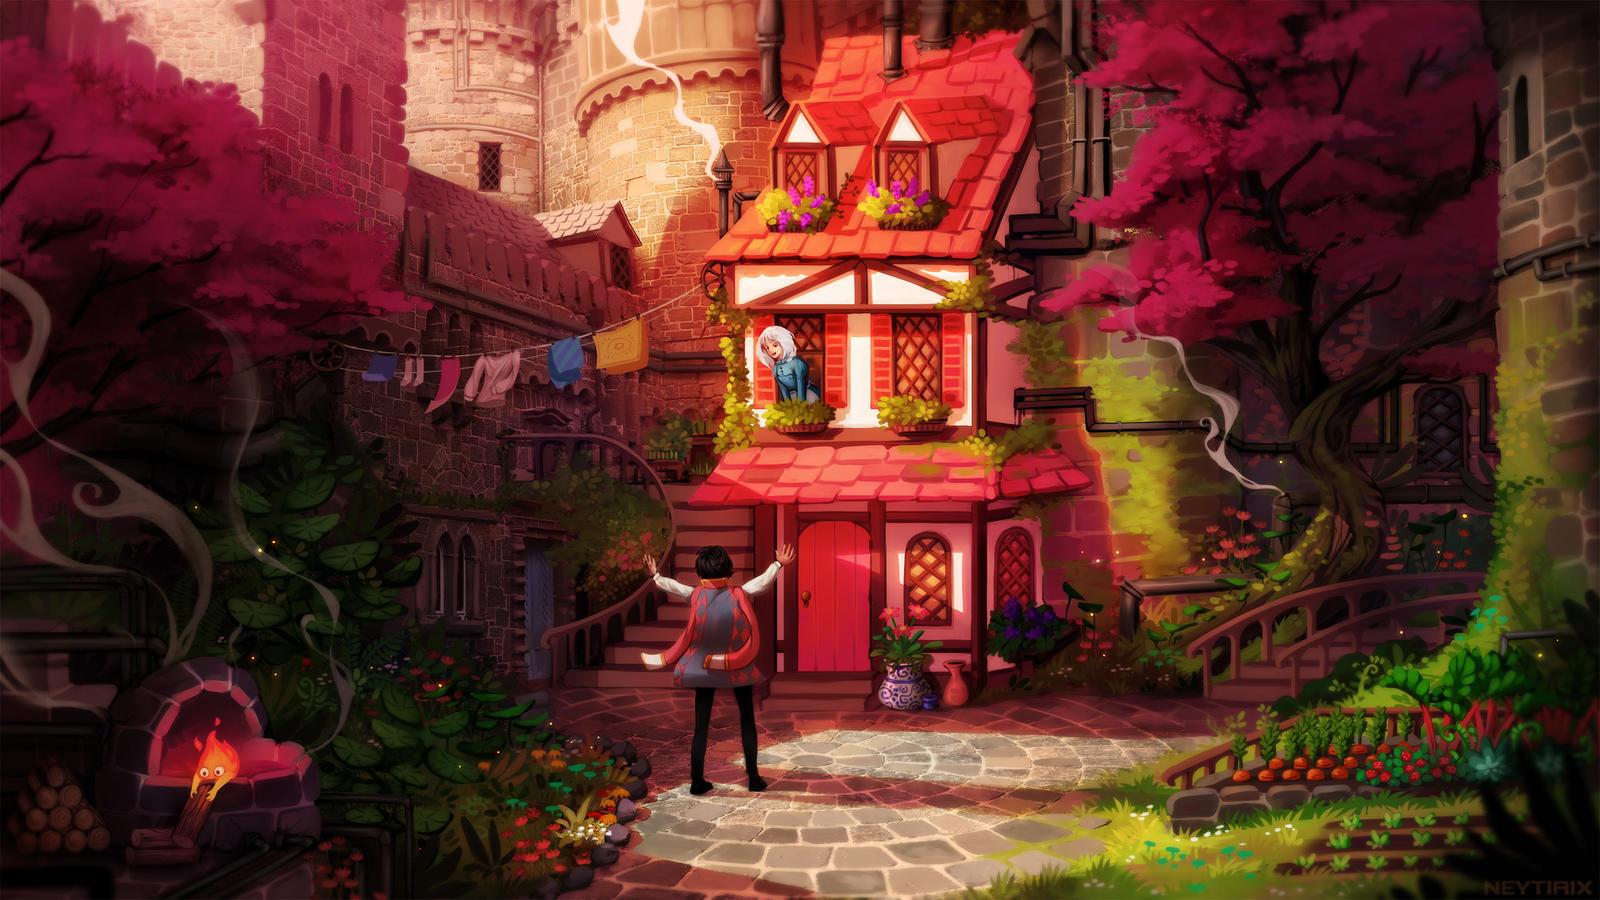 I'm Back! (Howl's Moving Castle Fanart) by Neytirix